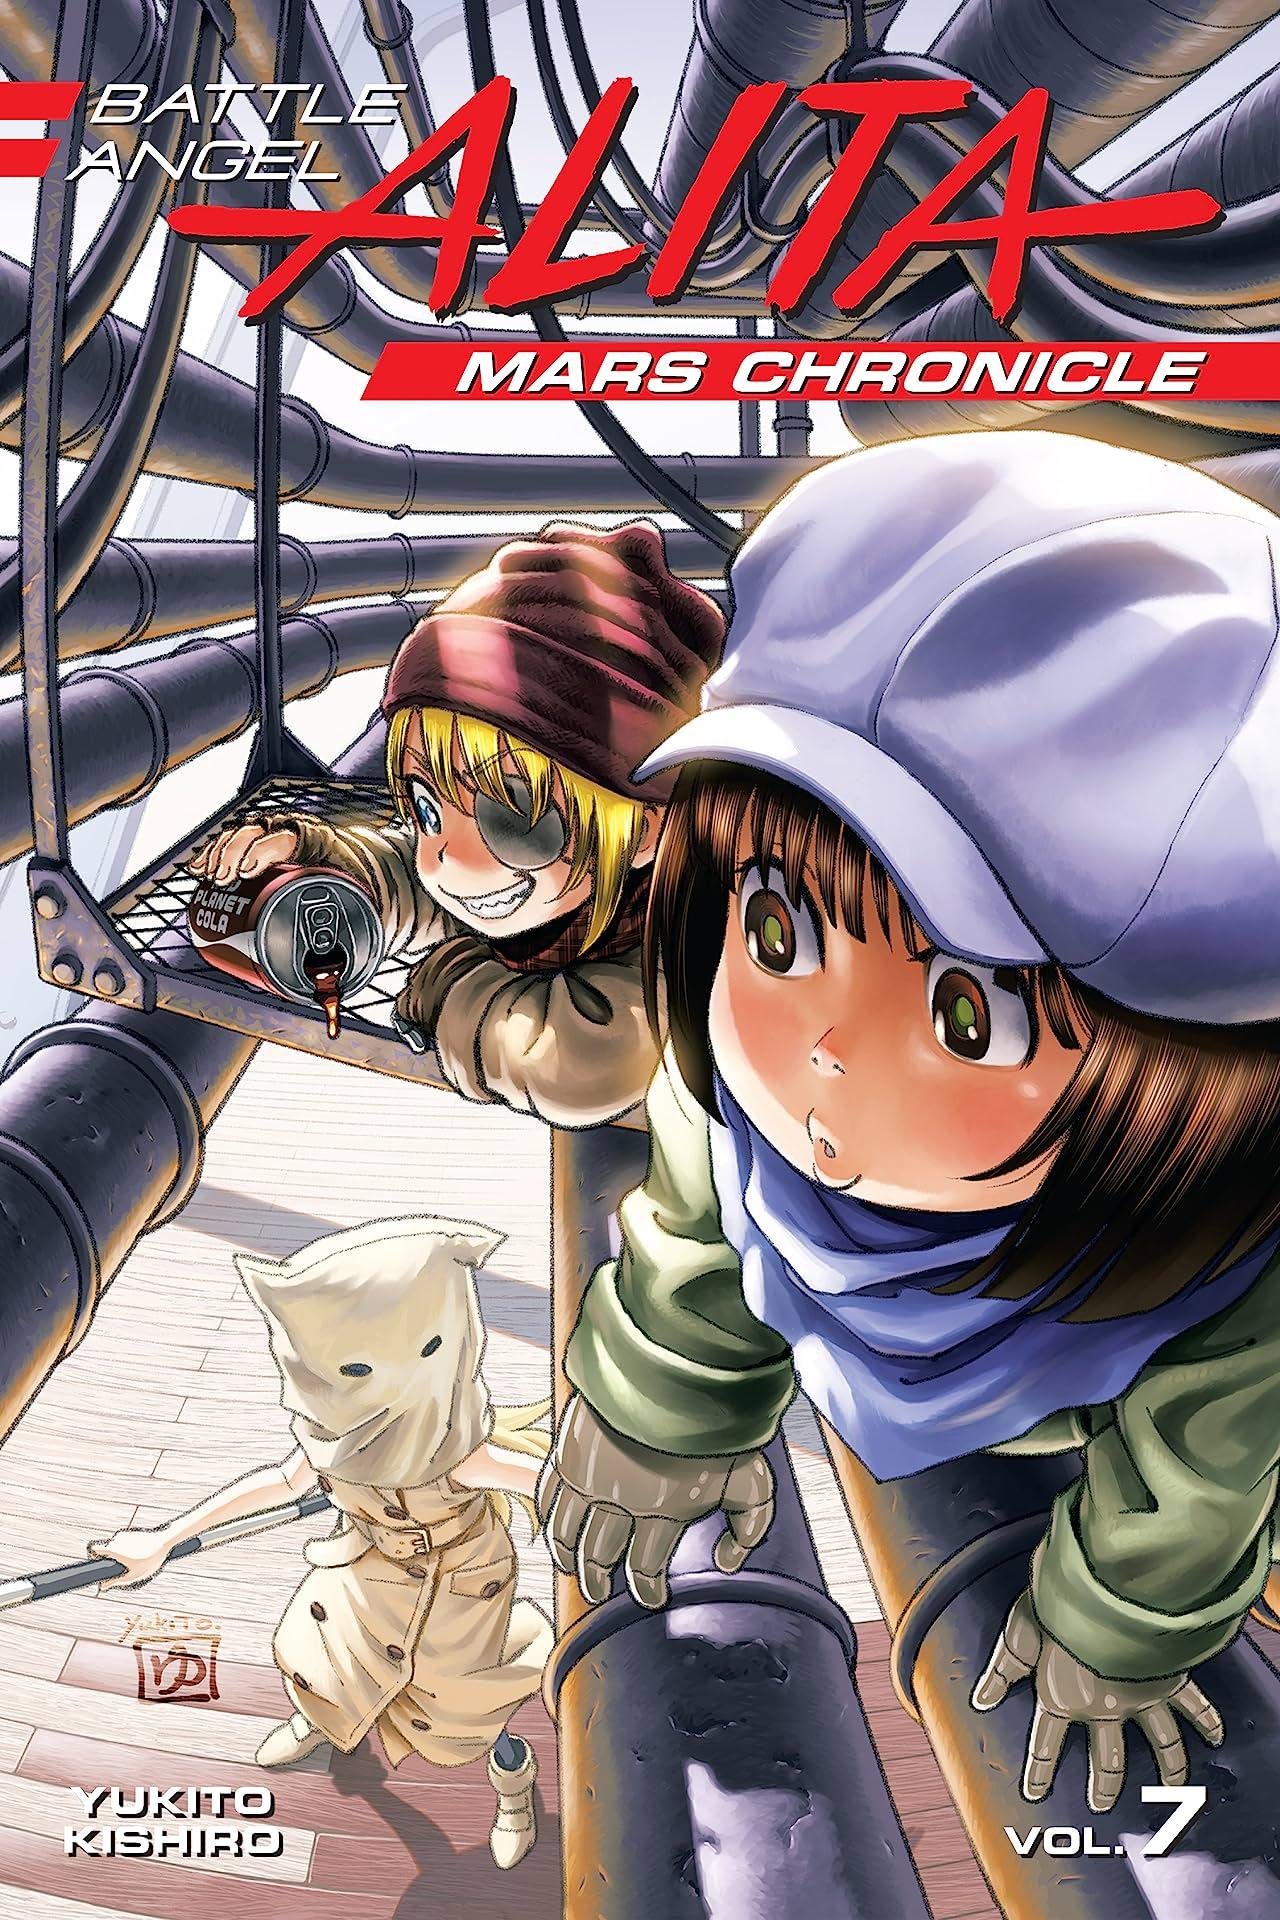 Battle Angel Alita Mars Chronicle Vol. 7